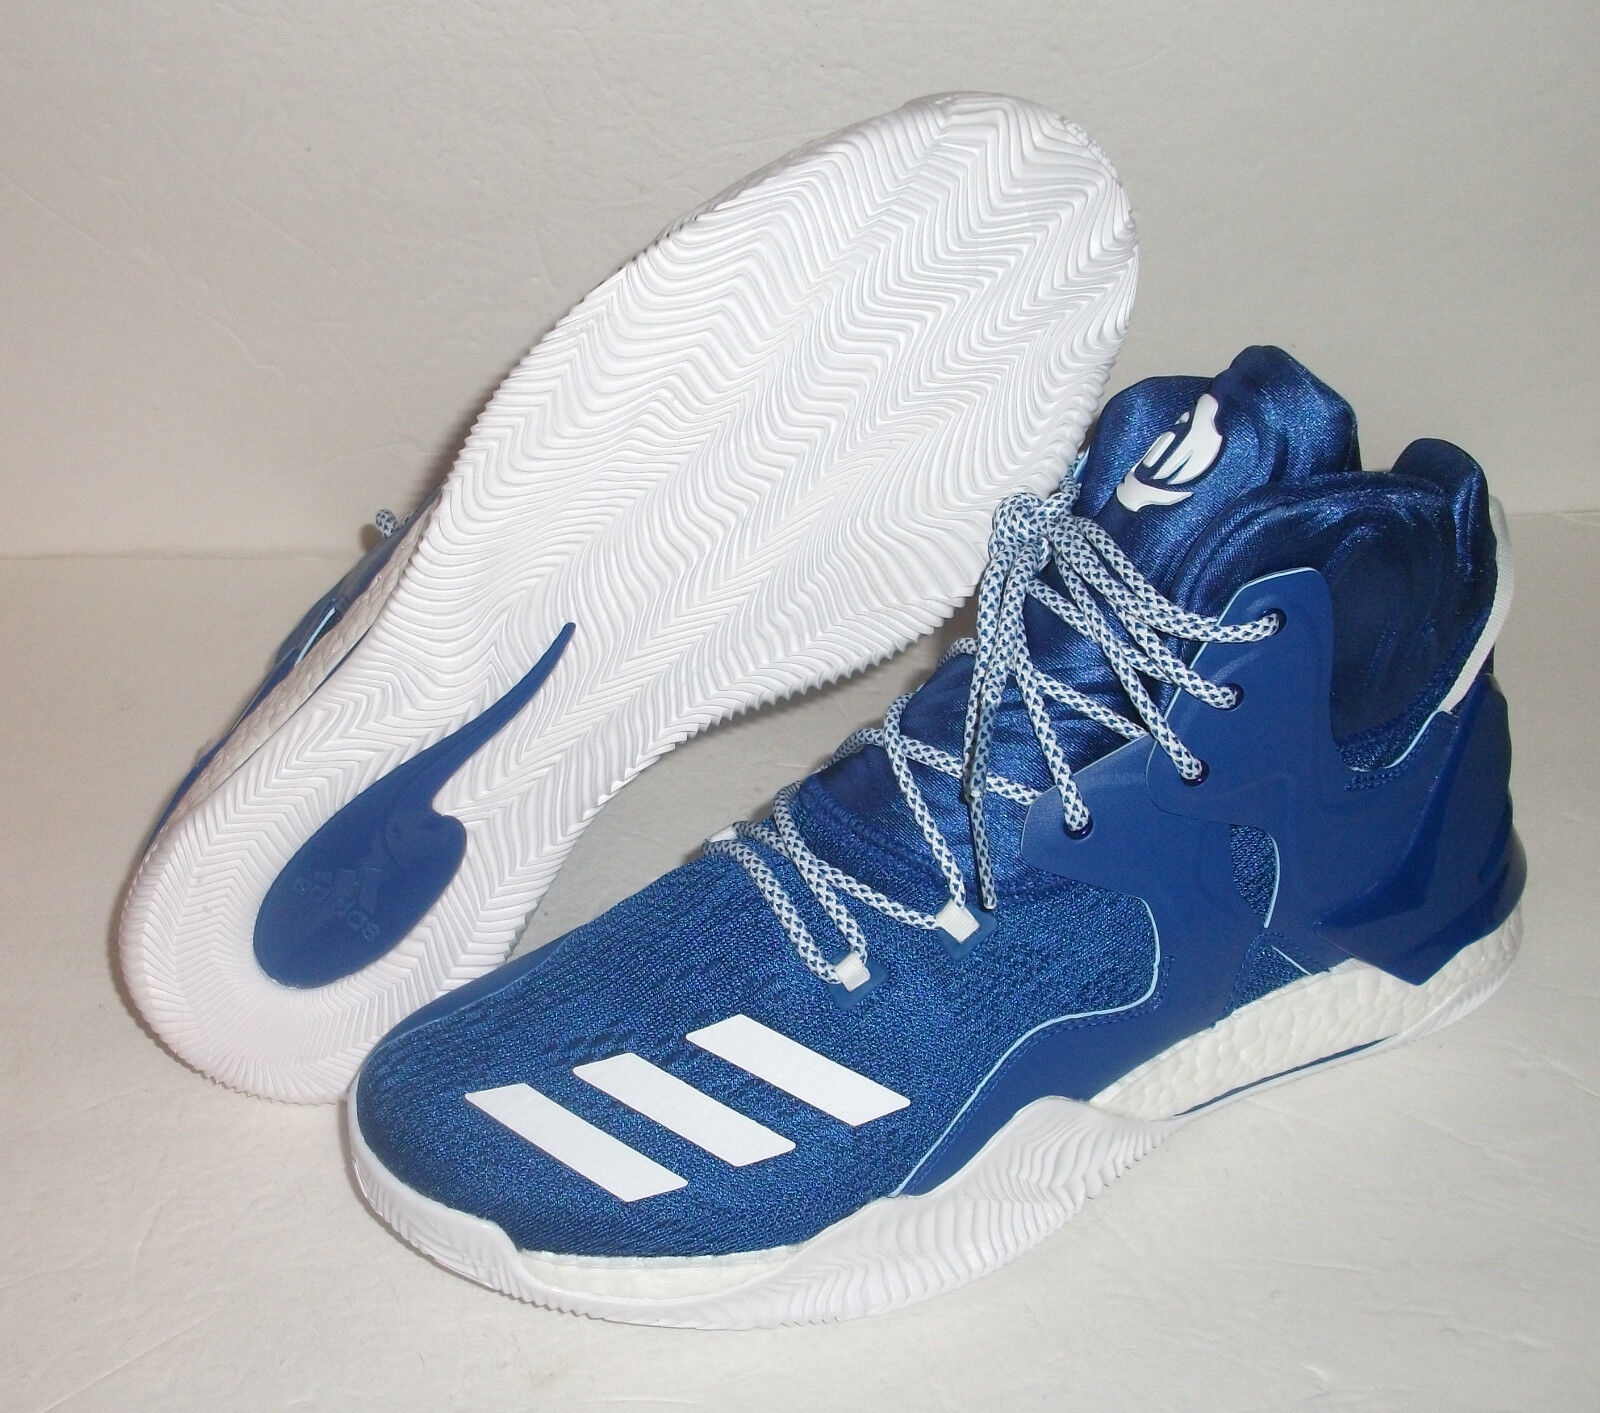 Nuove adidas s rose 7 scarpe da basket, uomo numero porcile 13, blu, porcile numero # b38922 9112fe